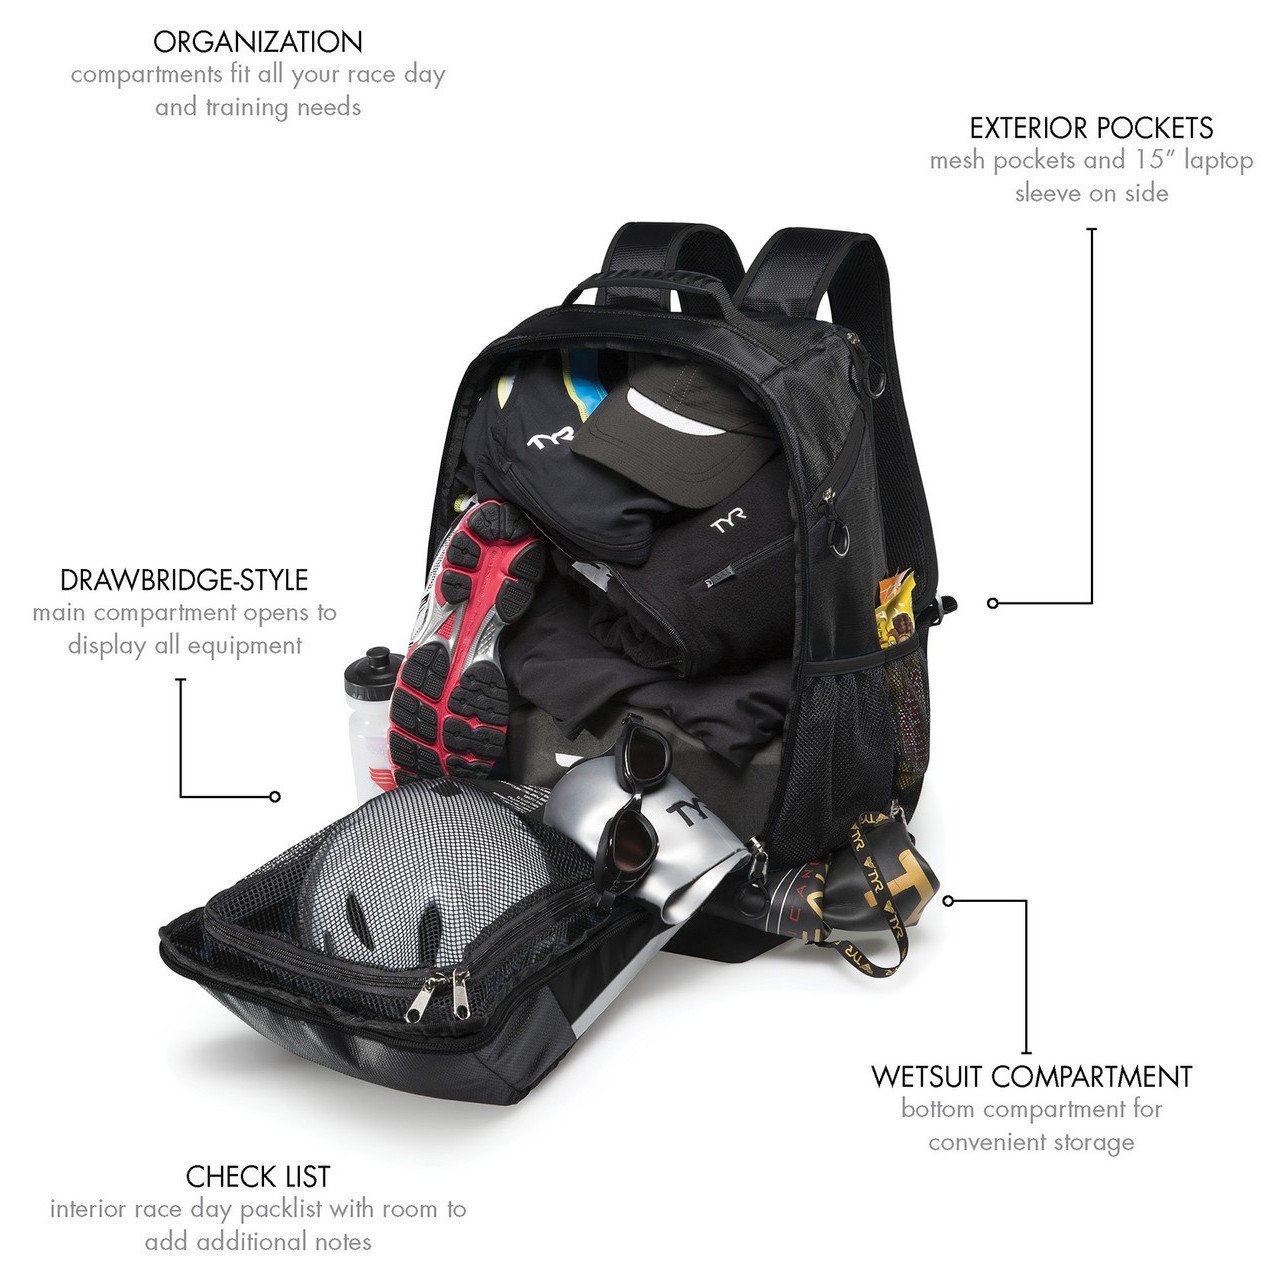 dfb84230e TYR Apex Triathlon Transition Bag - 2019